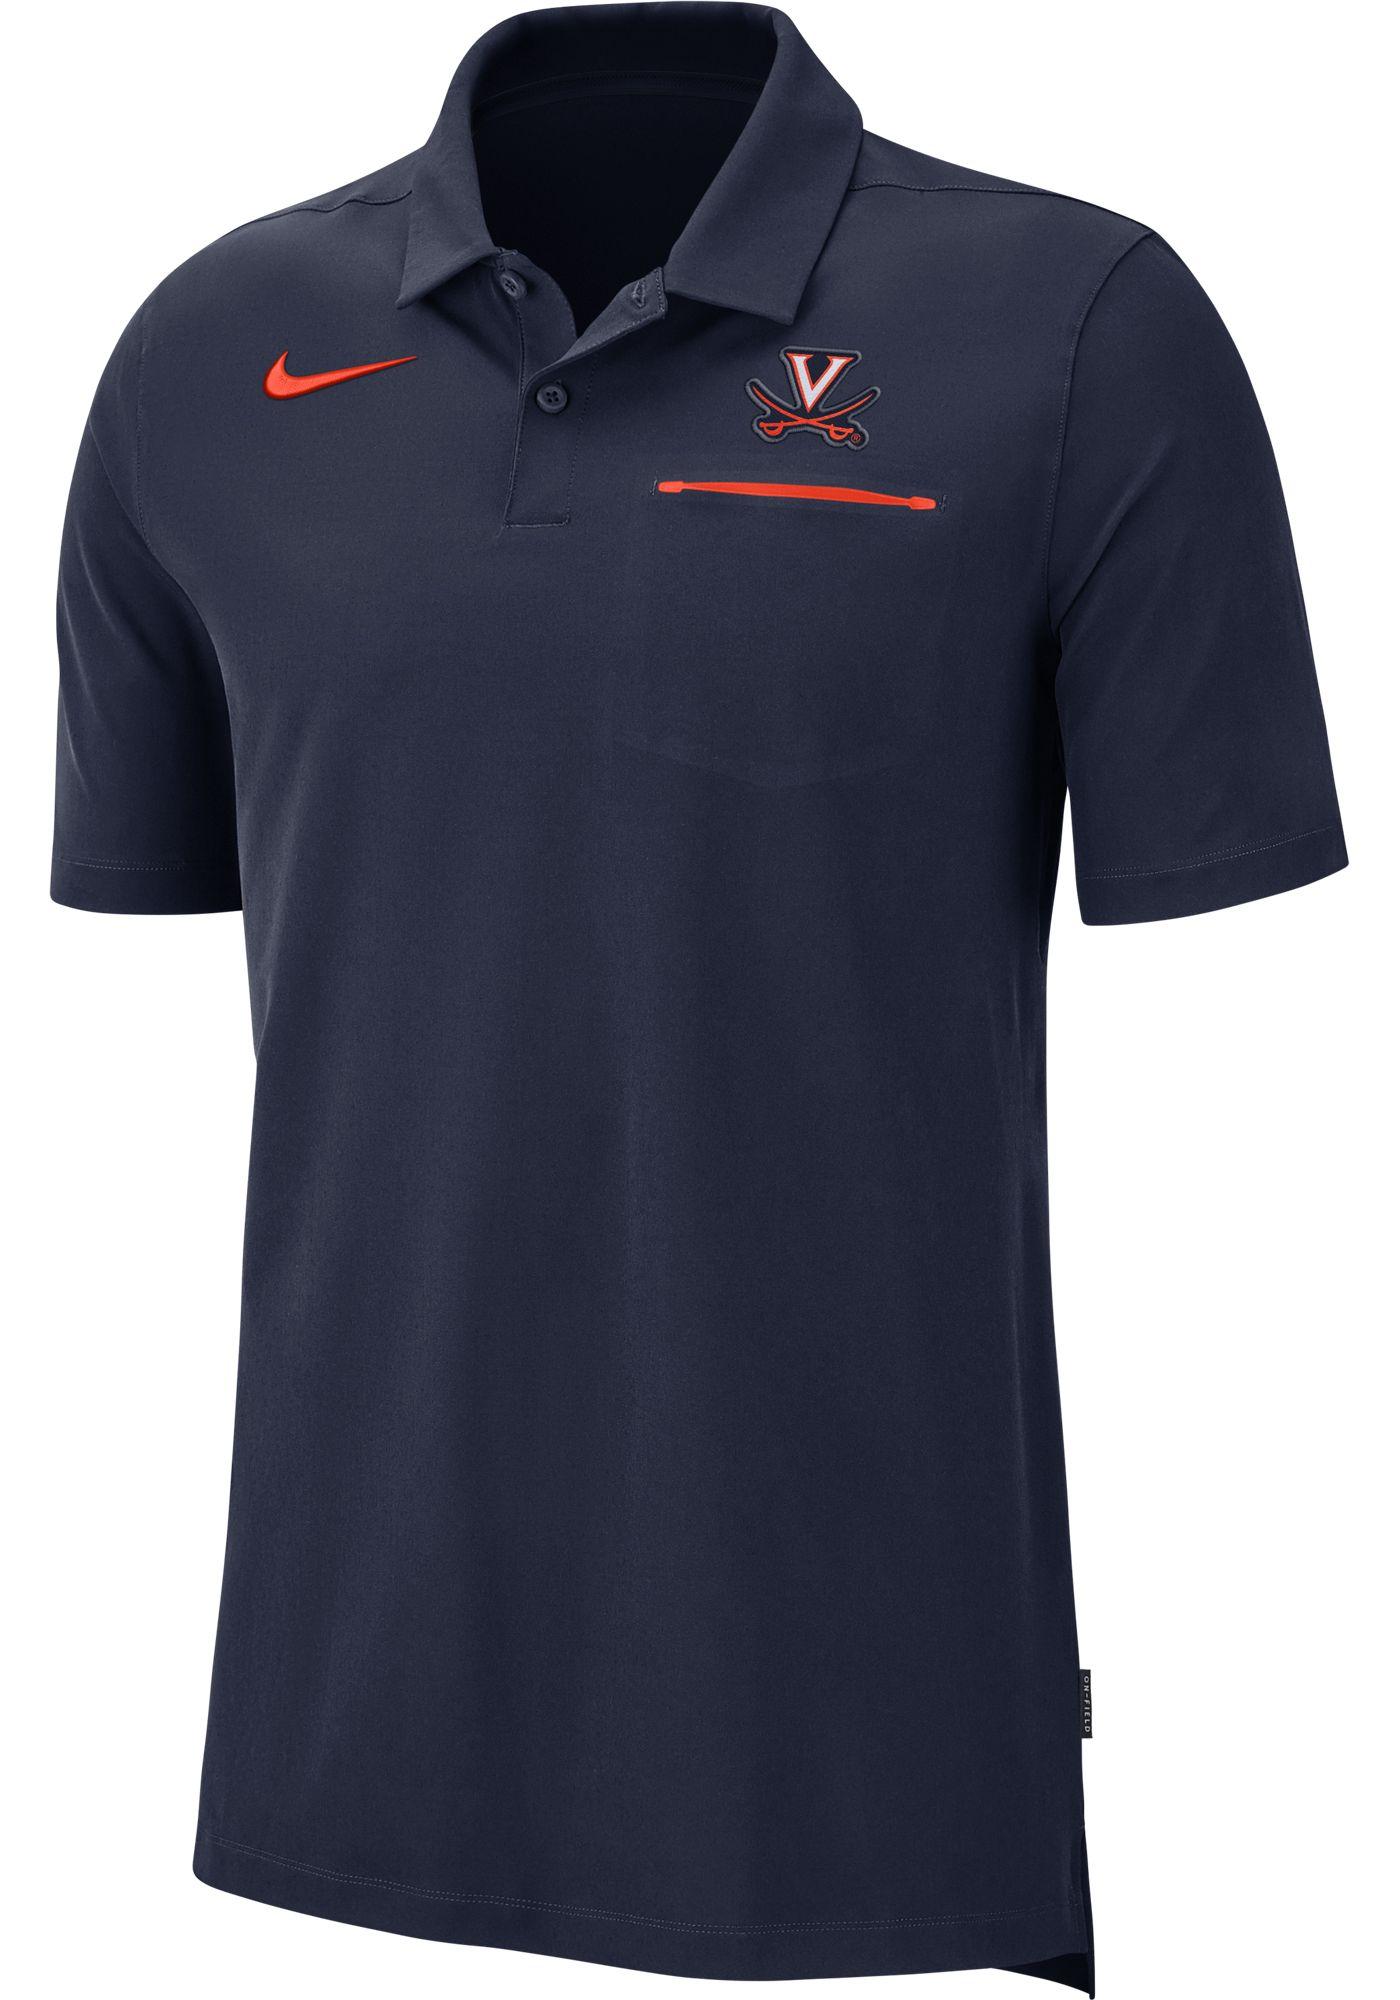 Nike Men's Virginia Cavaliers Blue Dri-FIT Elite Football Sideline Polo